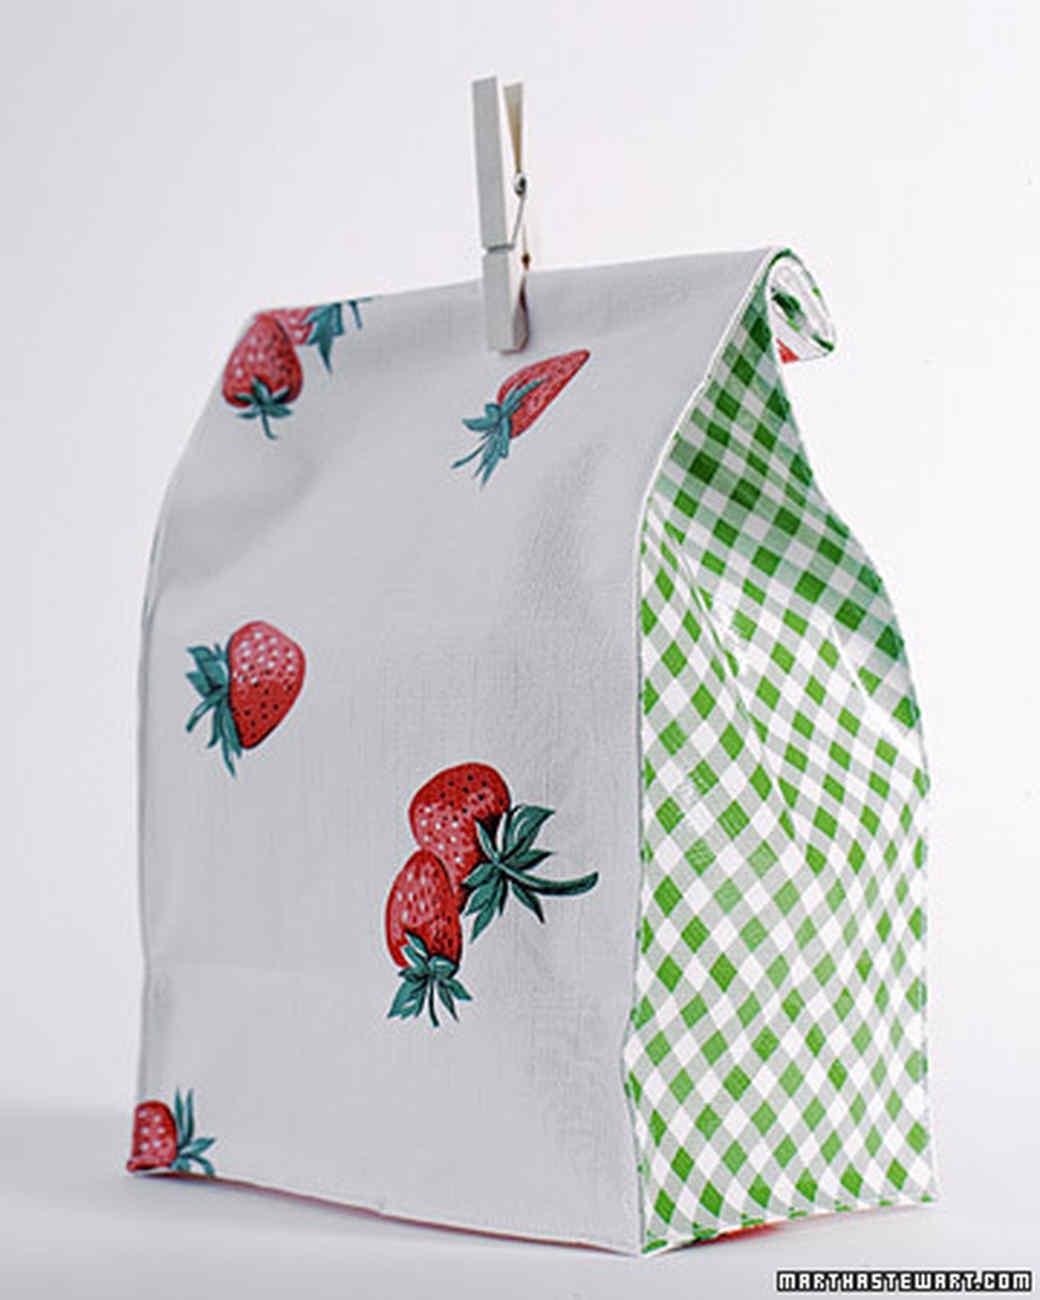 a98535_0701_strawberrybag.jpg